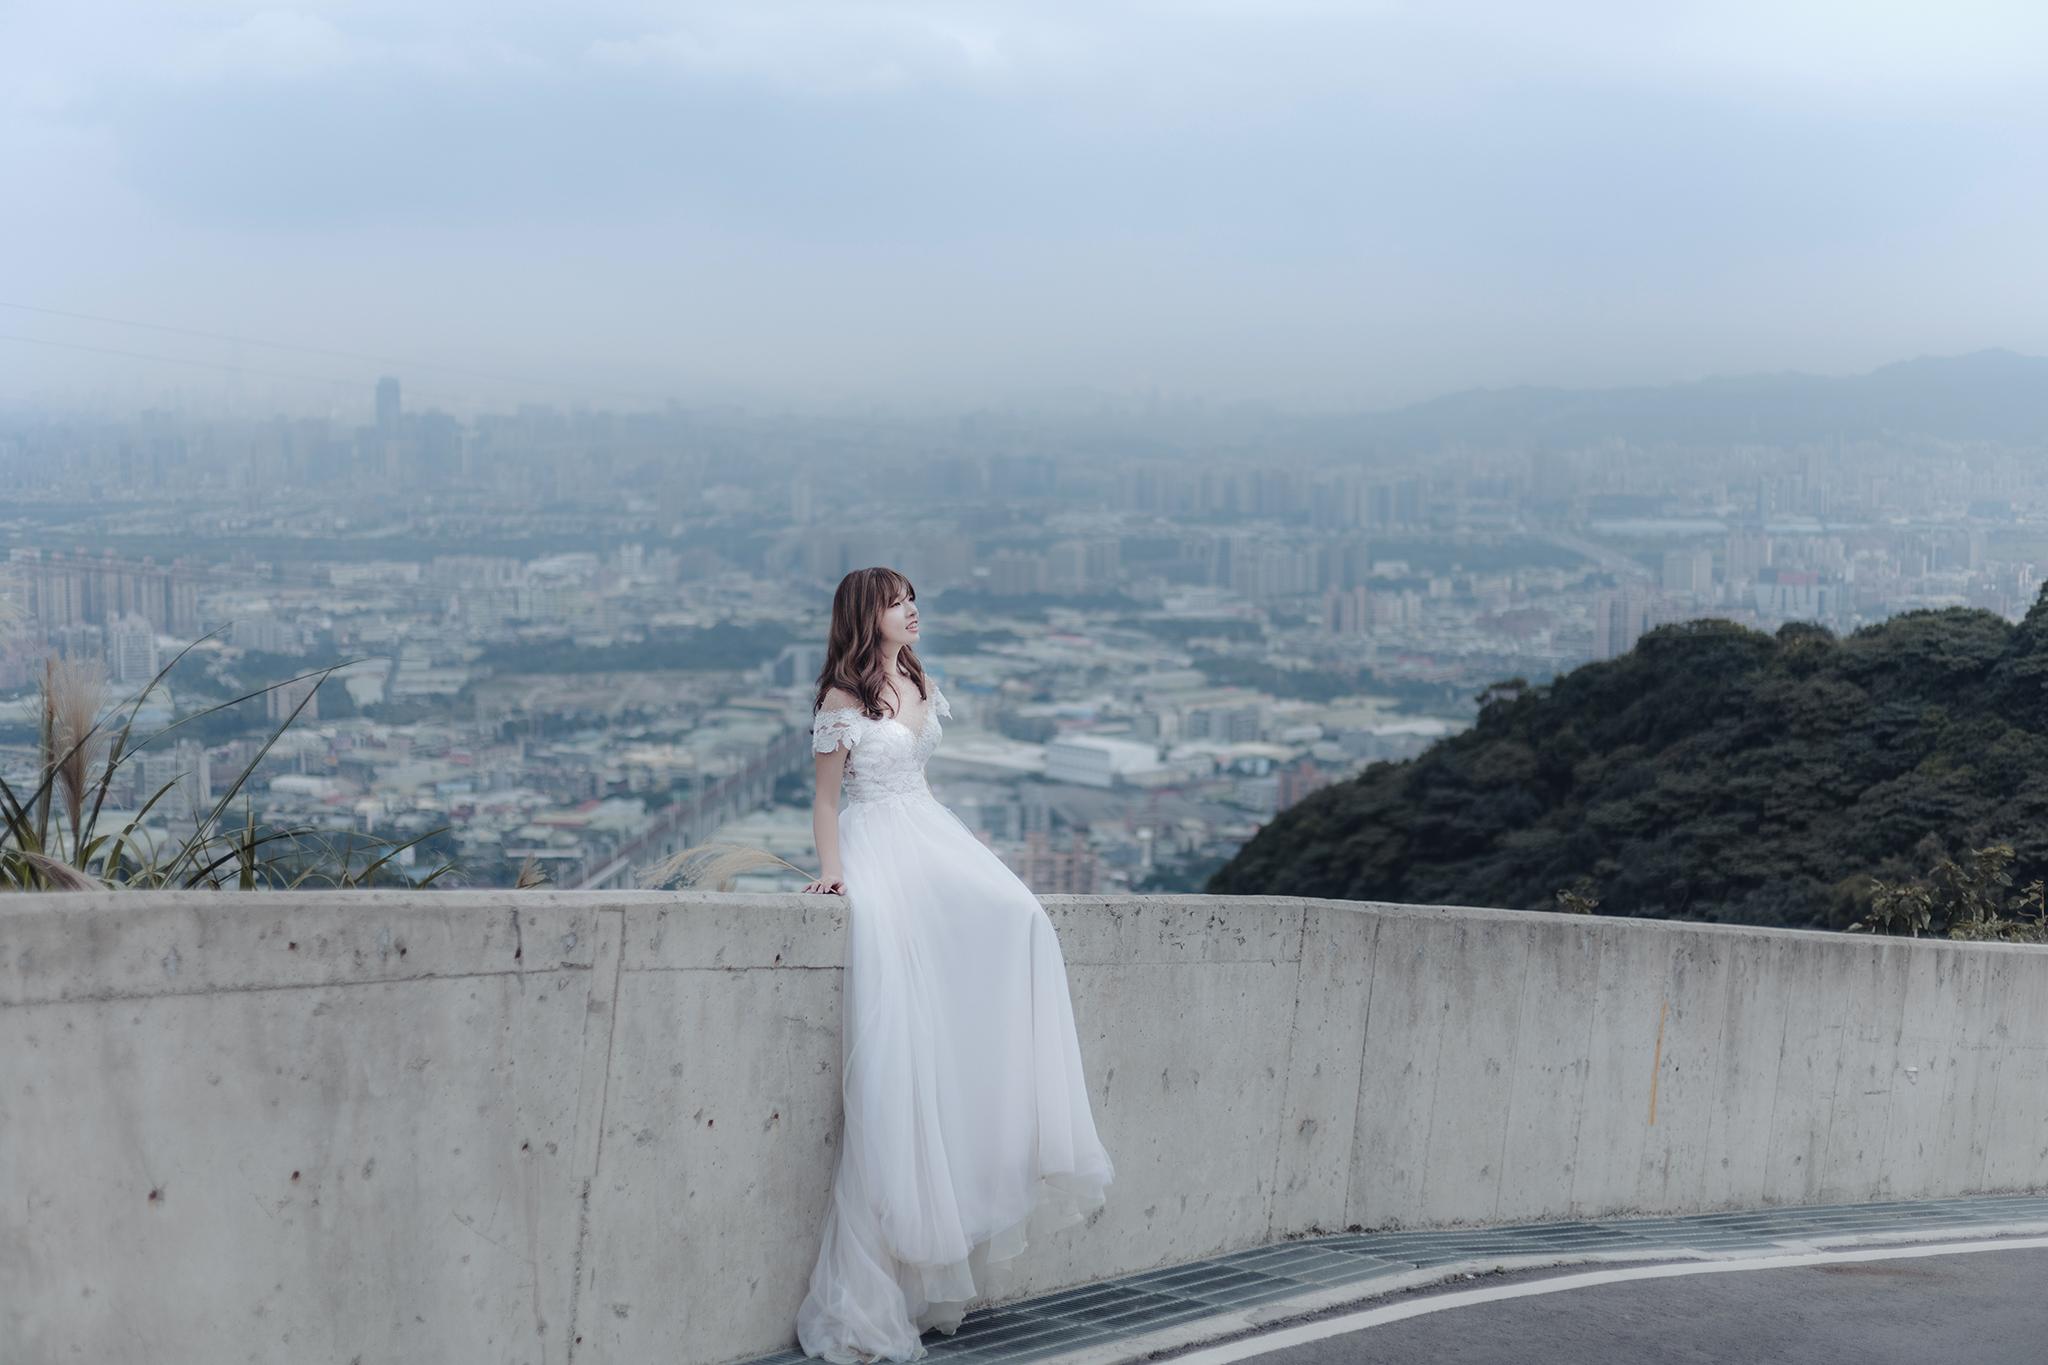 50697325122 18bec3852a o - 【自主婚紗】+凱婷+